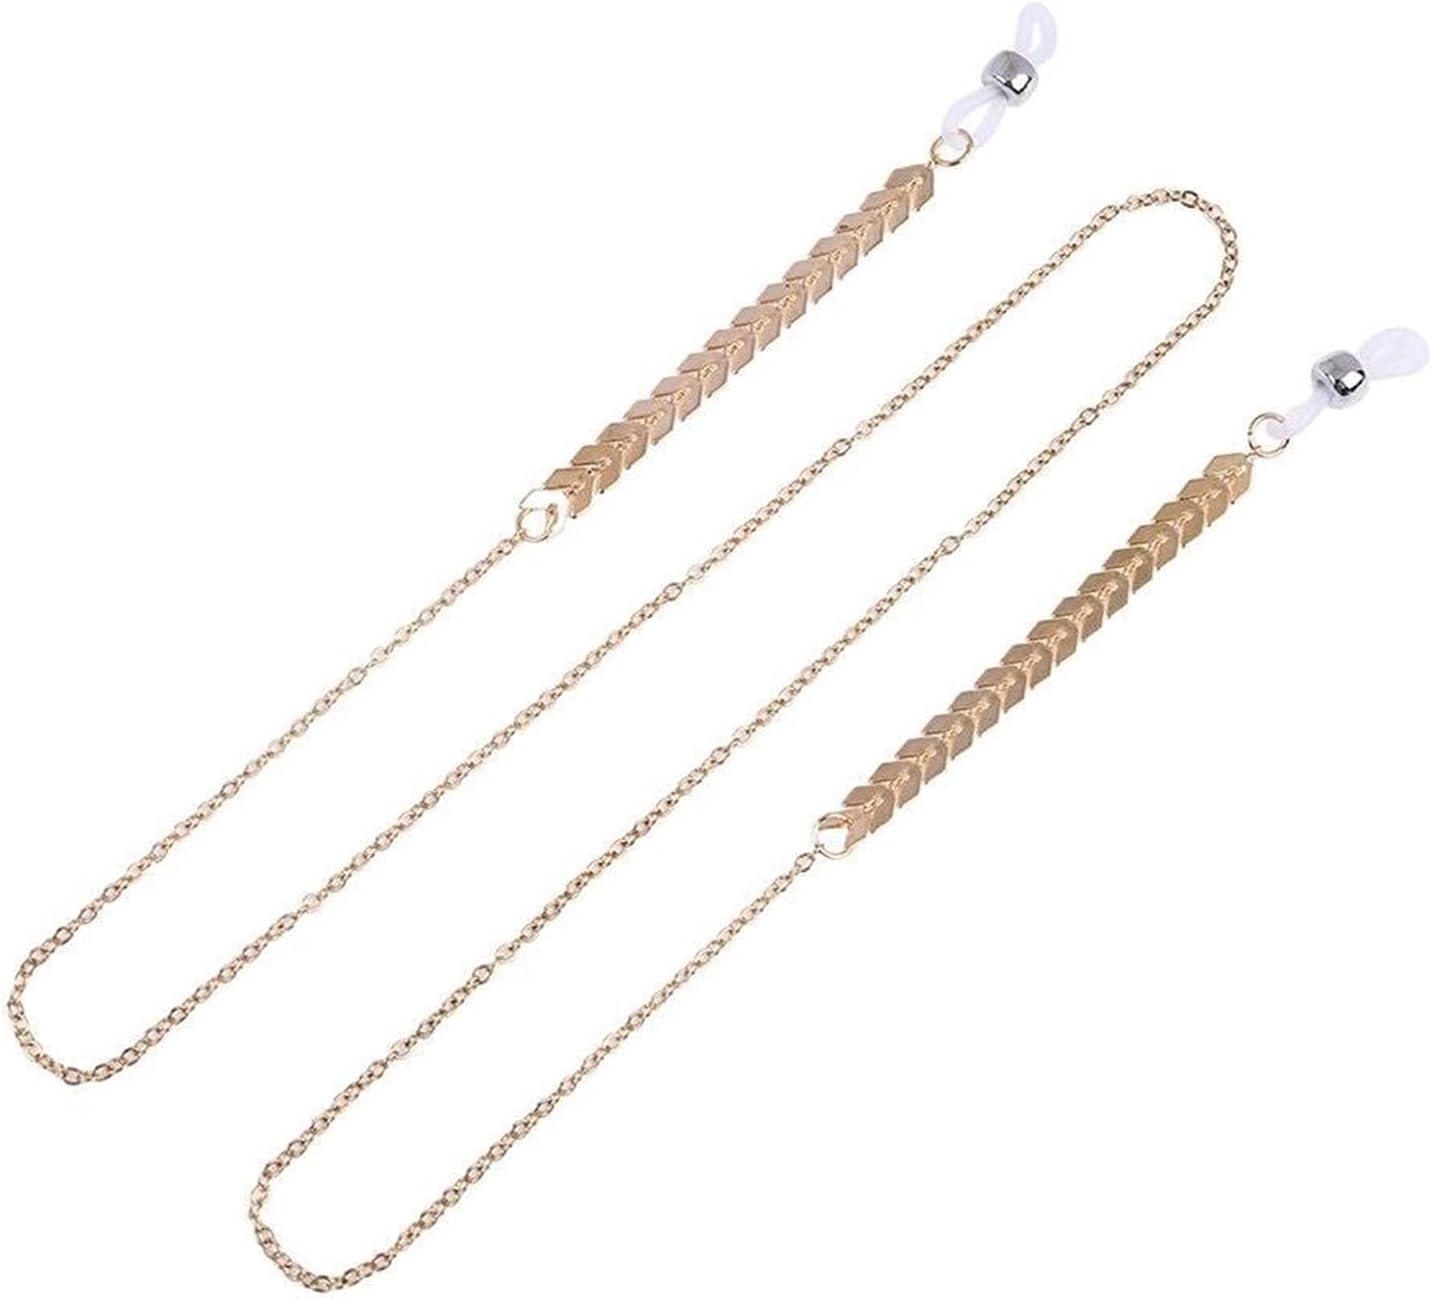 AMFG 5-Piece Metal Lady Leaf Shape Glasses Chain Silicone Anti-Drop Glasses Lanyard Chain